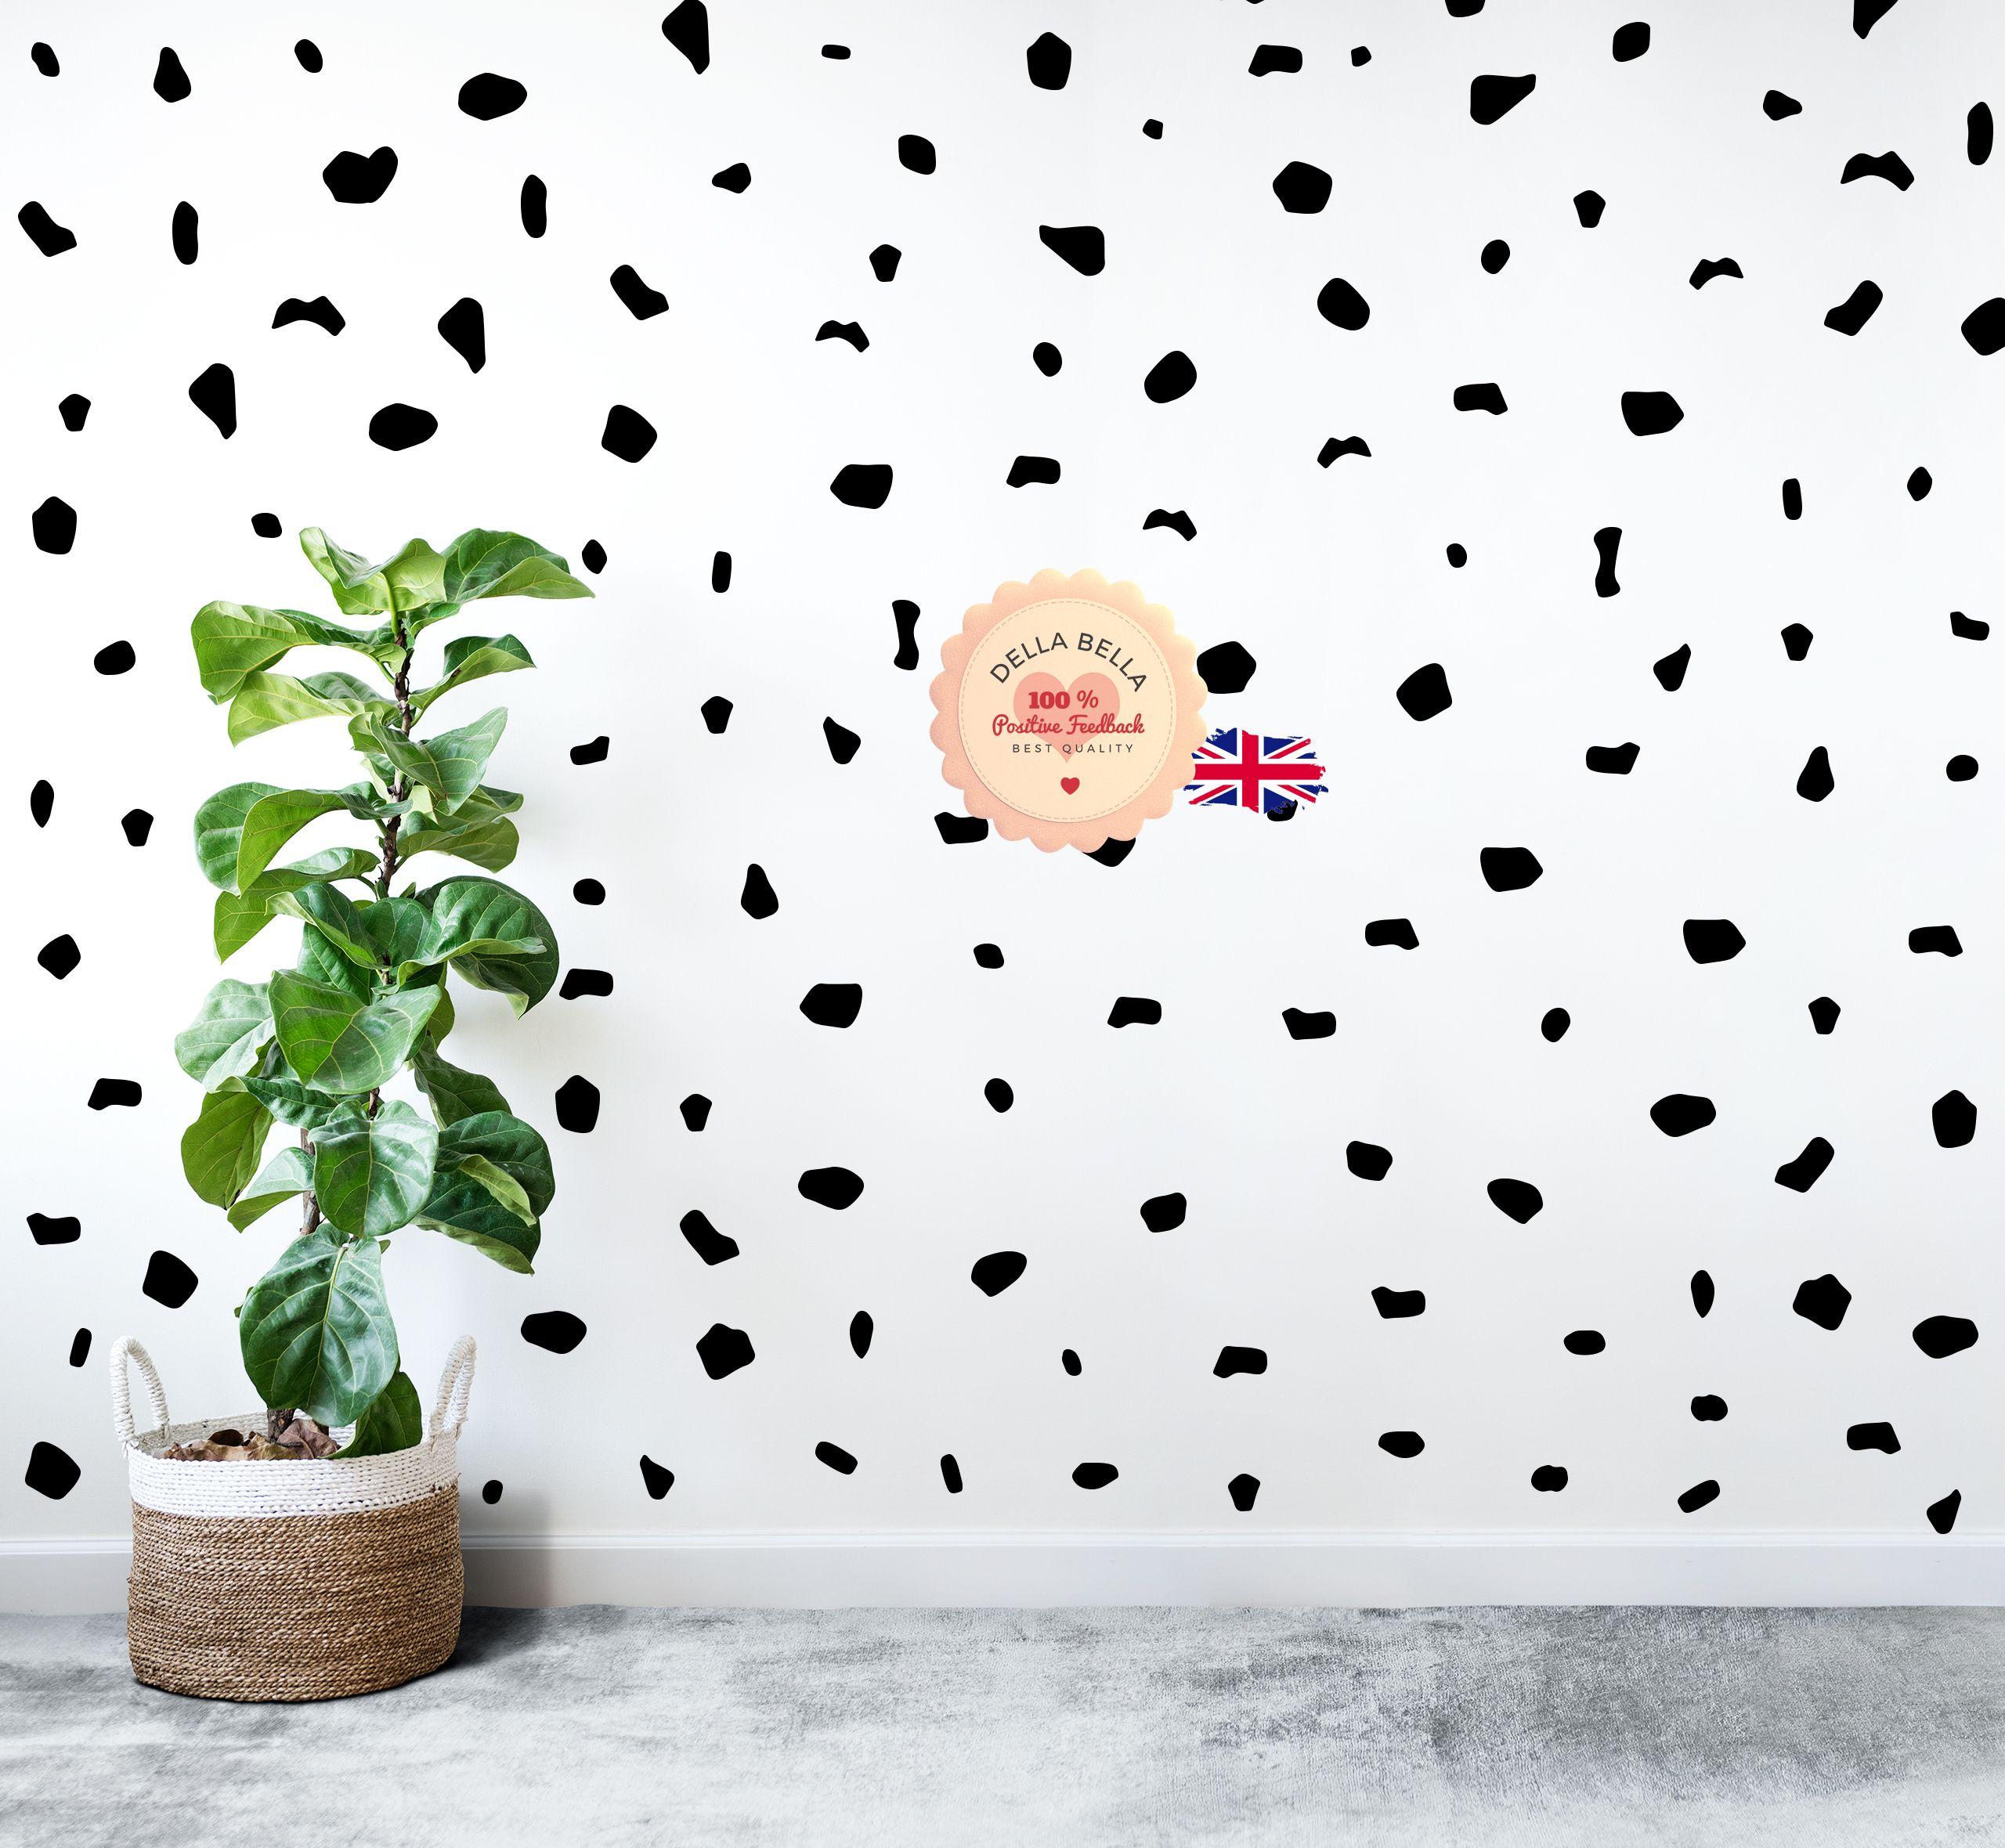 105 DALMATIAN DOTS wall decal stickers Dot Print Bedroom interior decal art